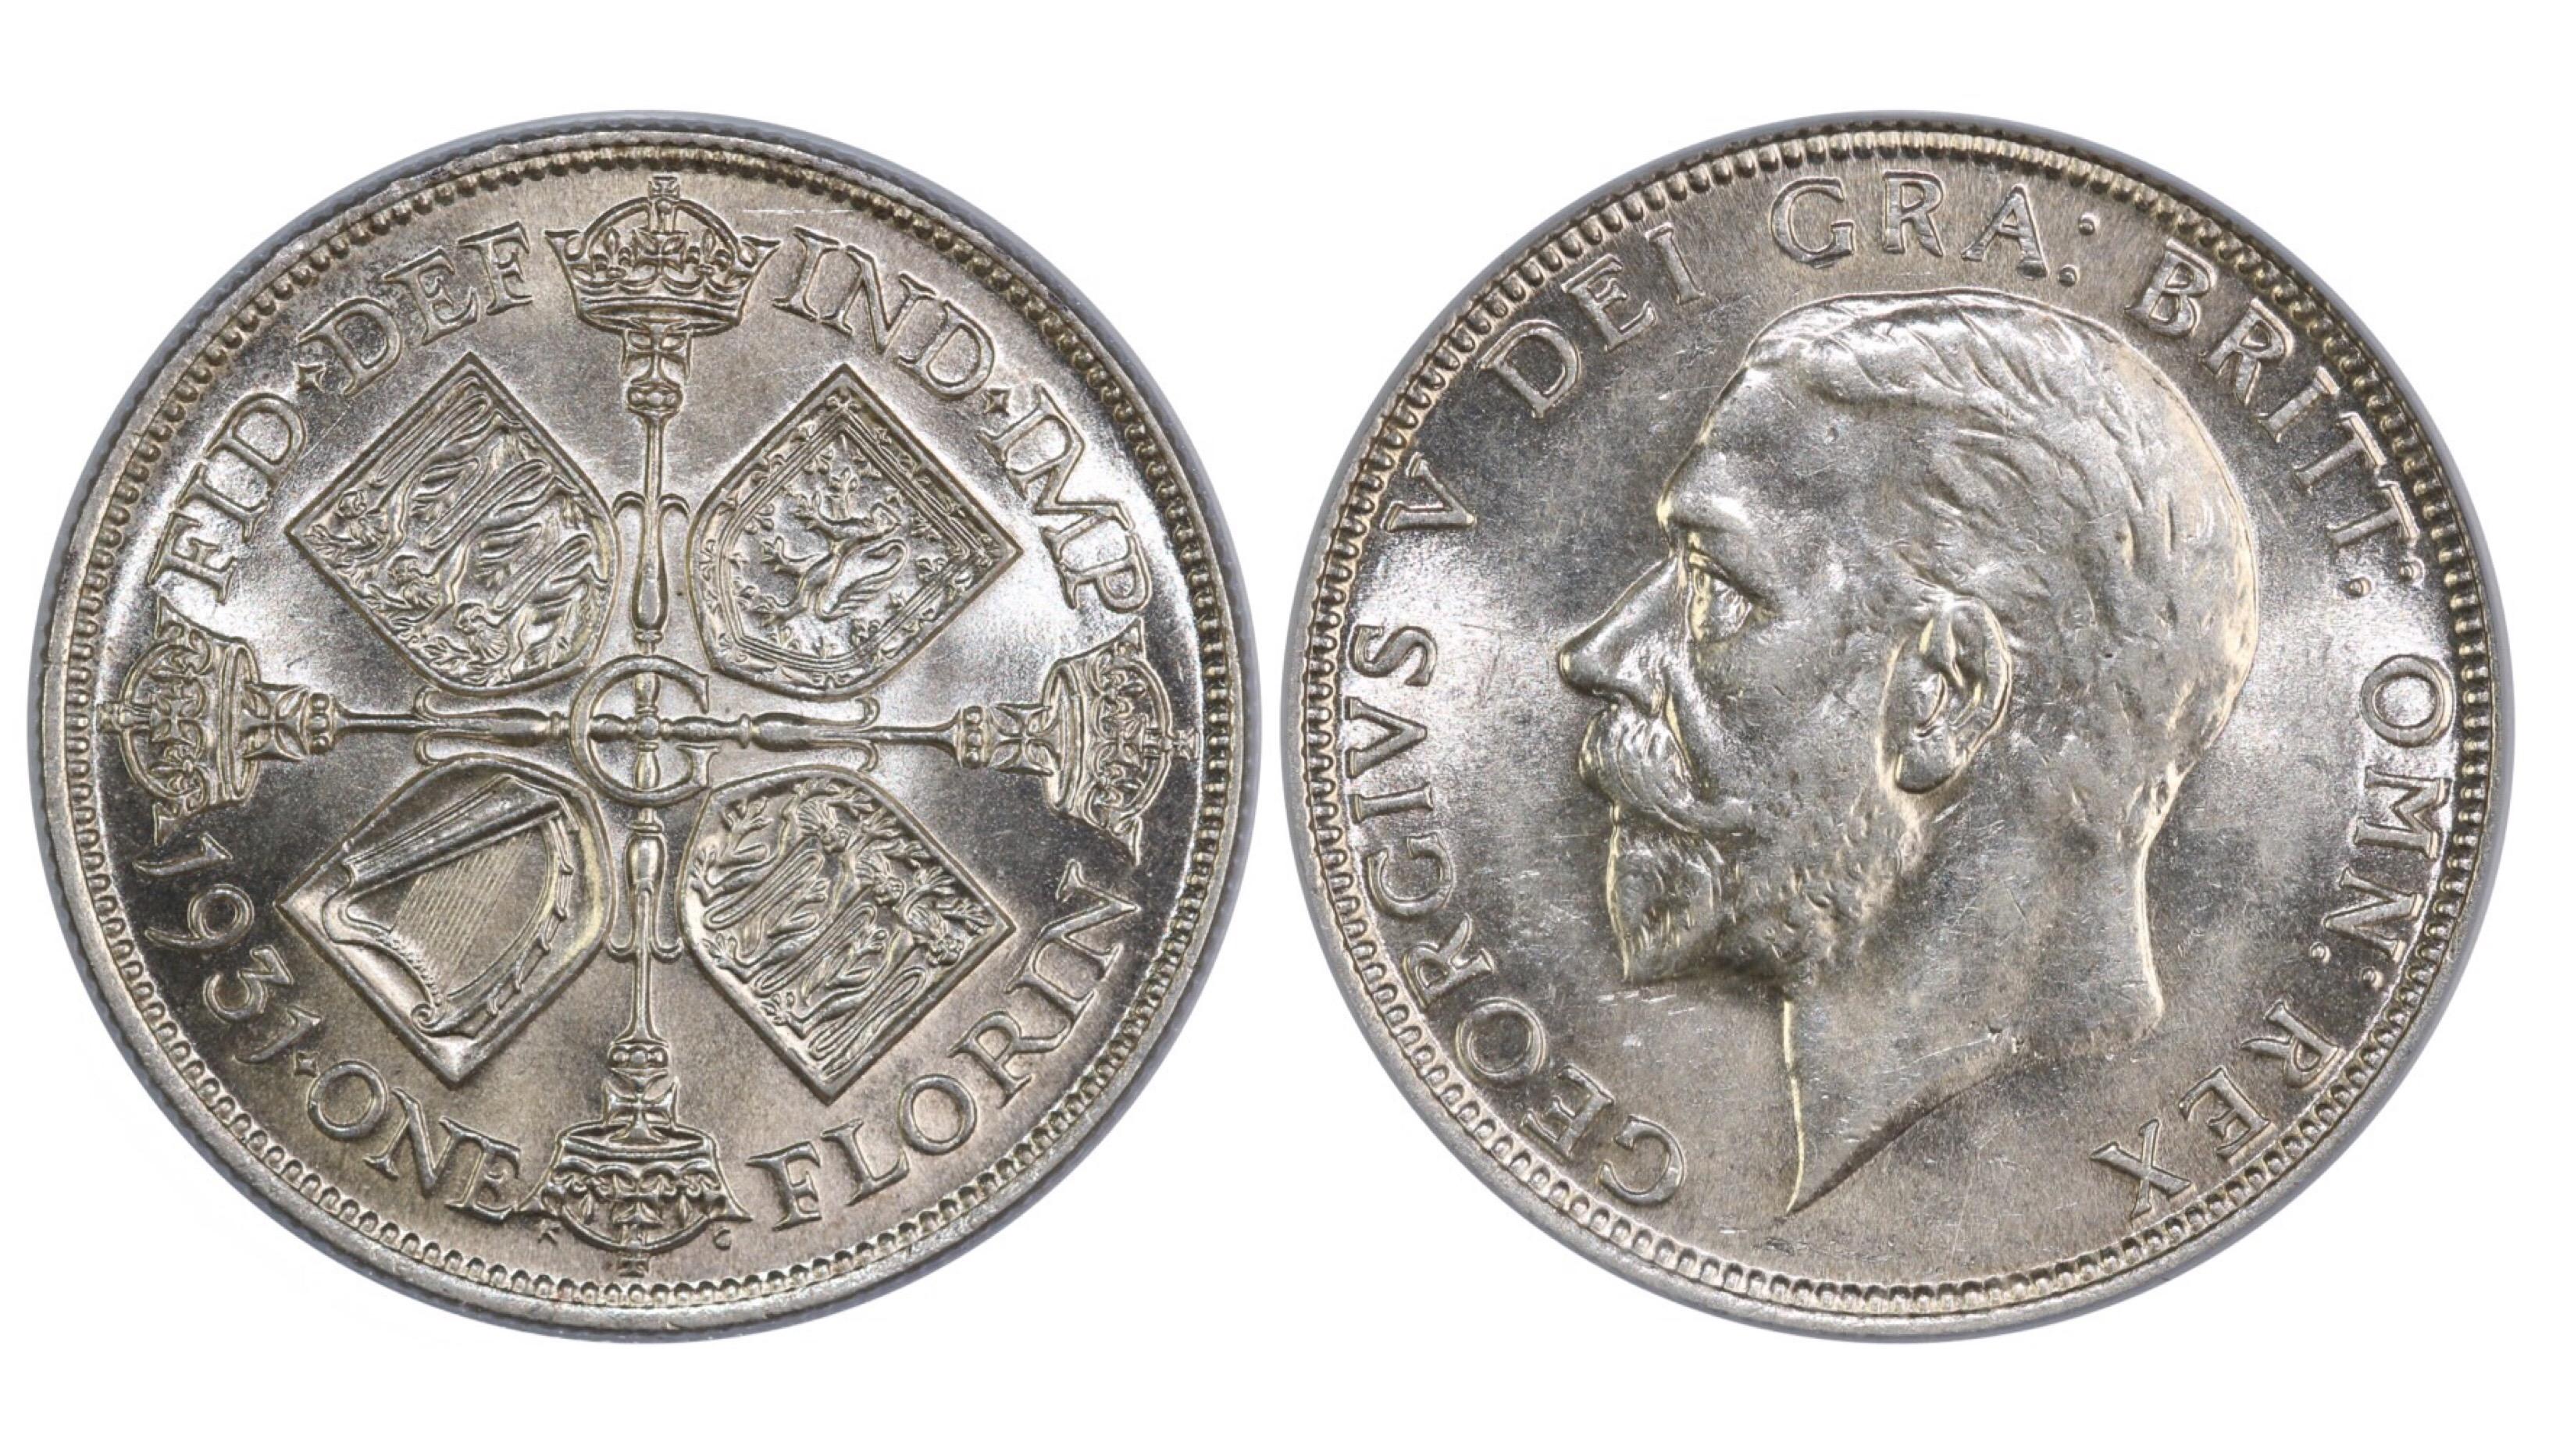 1931 Florin, CGS 78, UNC, George V, ESC 951, UIN